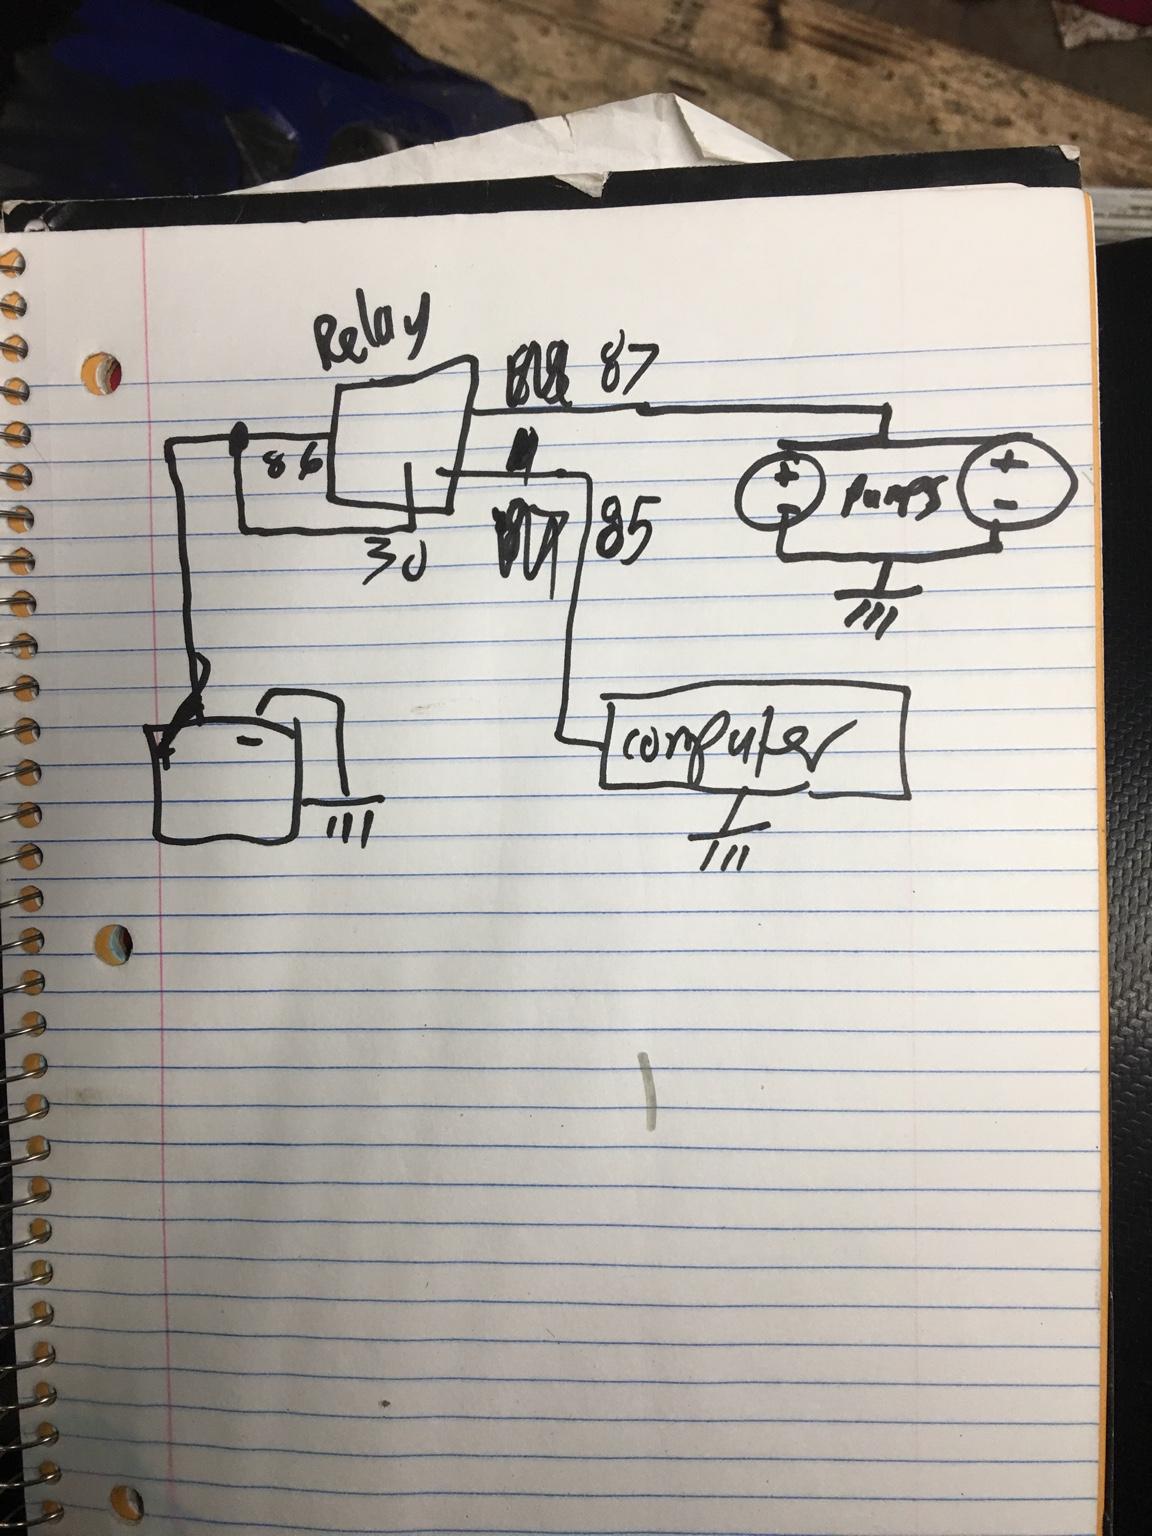 Mach 1000 wiring diagram chevelle race car wiring in enchanting mach z wiring diagram 1 gallery best image wire binvmus 1b3c4ff8804185d1f9d0cd17531fdbaf mach z wiring diagram 1html mach 1000 wiring diagram asfbconference2016 Images